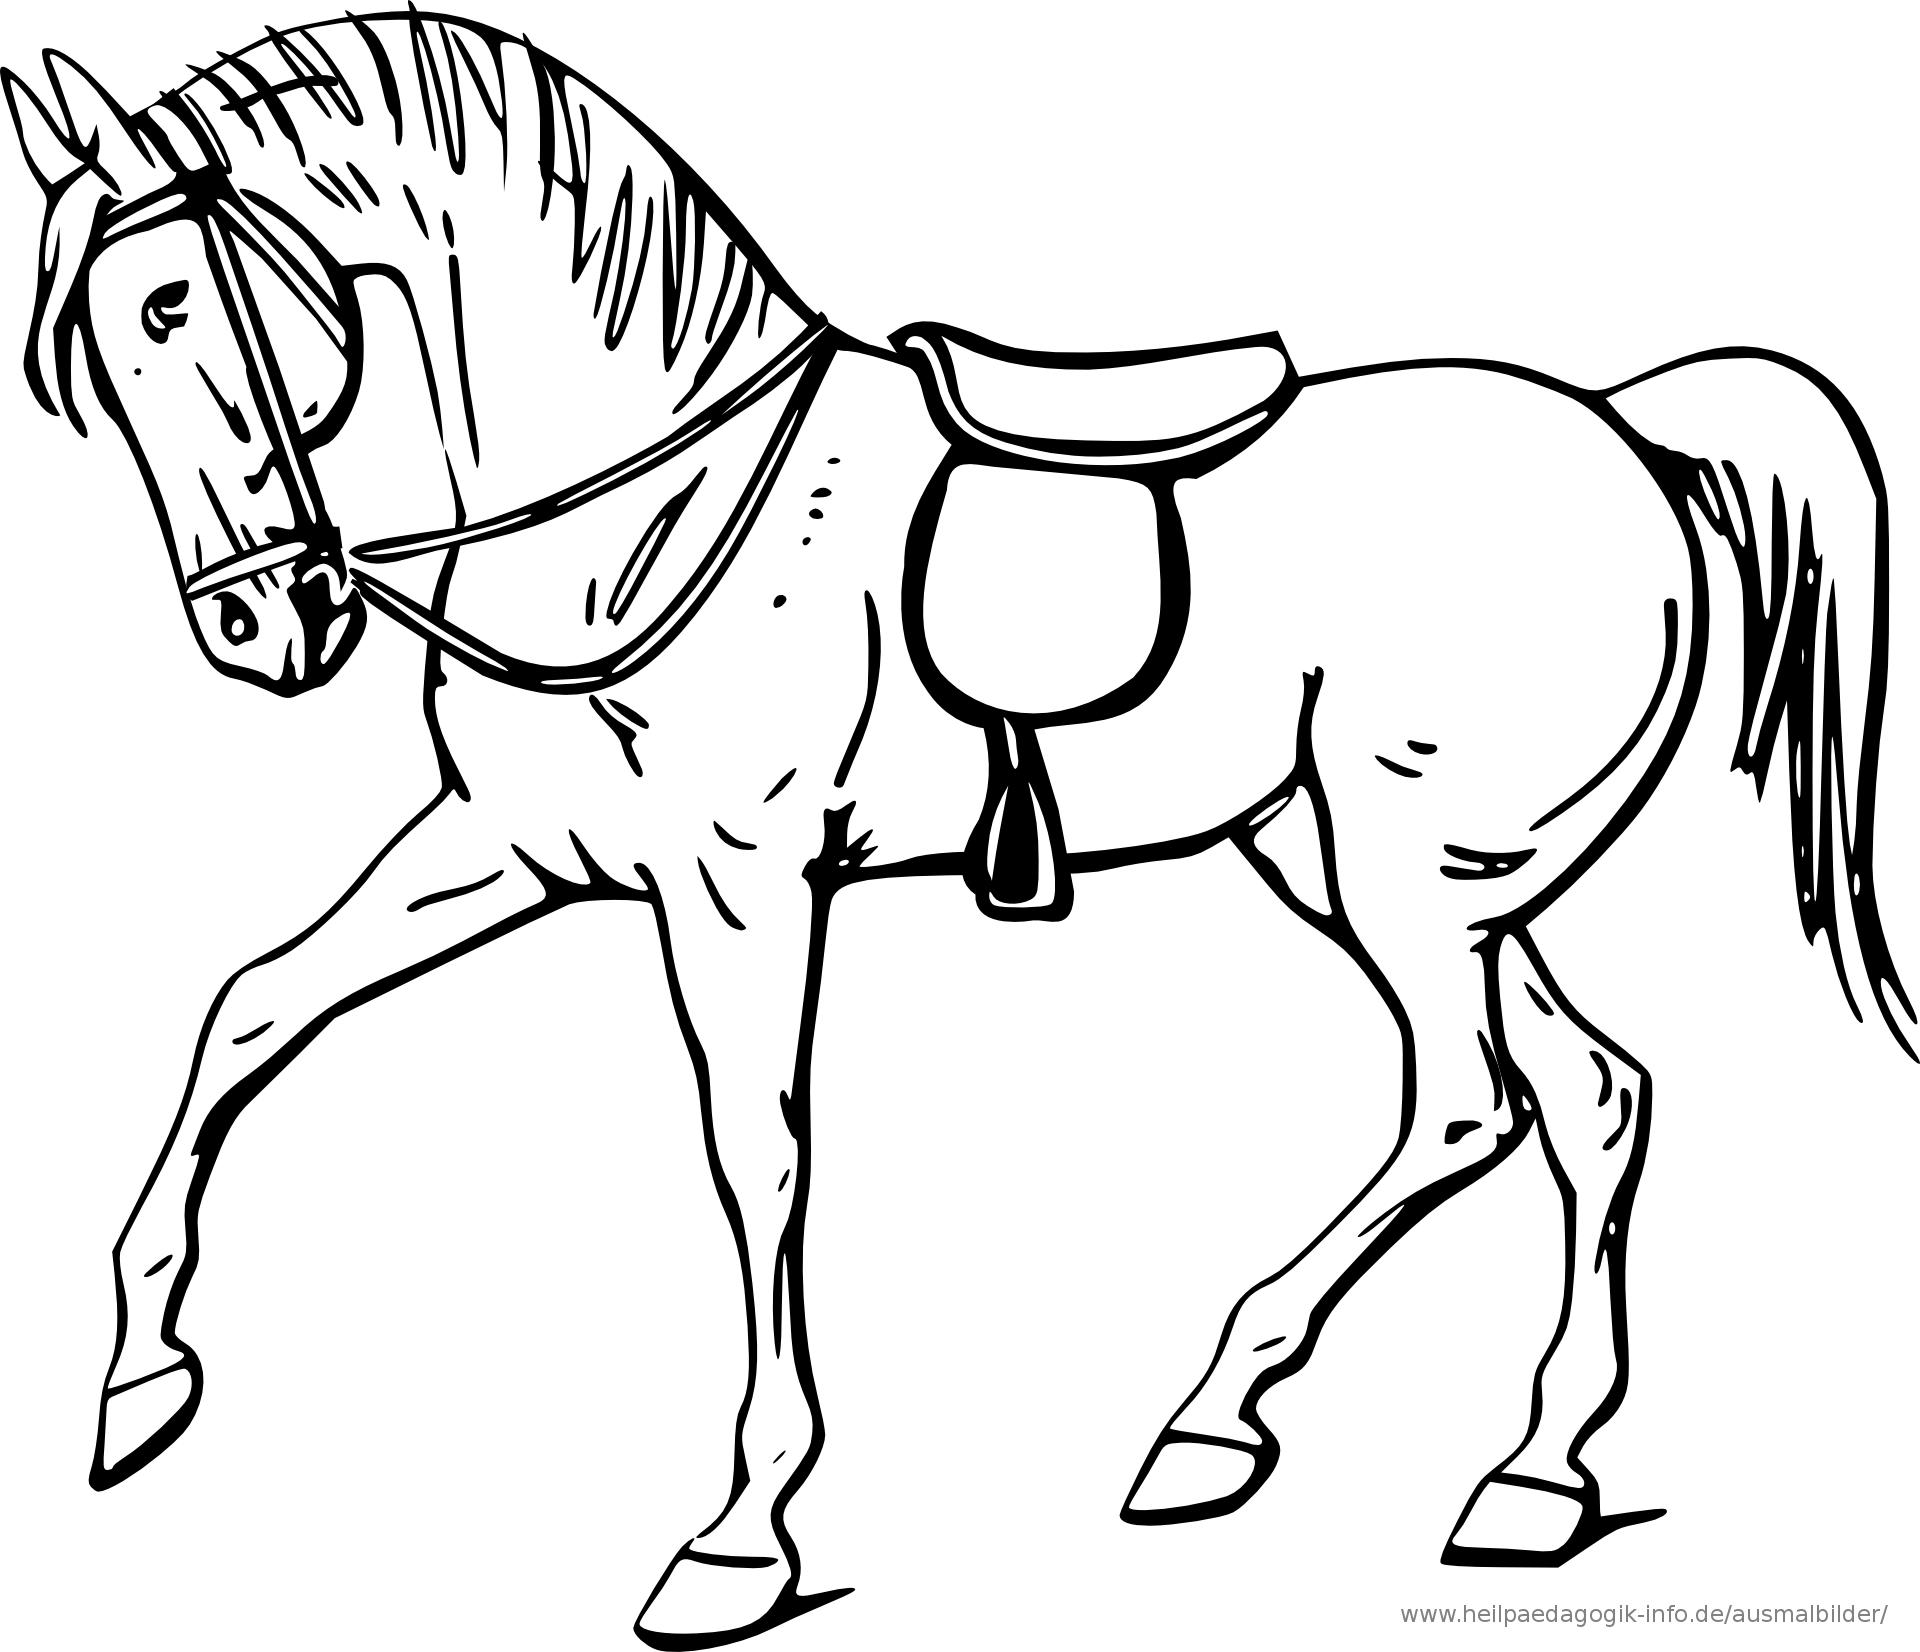 Coloring book horses - Coloring Book Horses 21